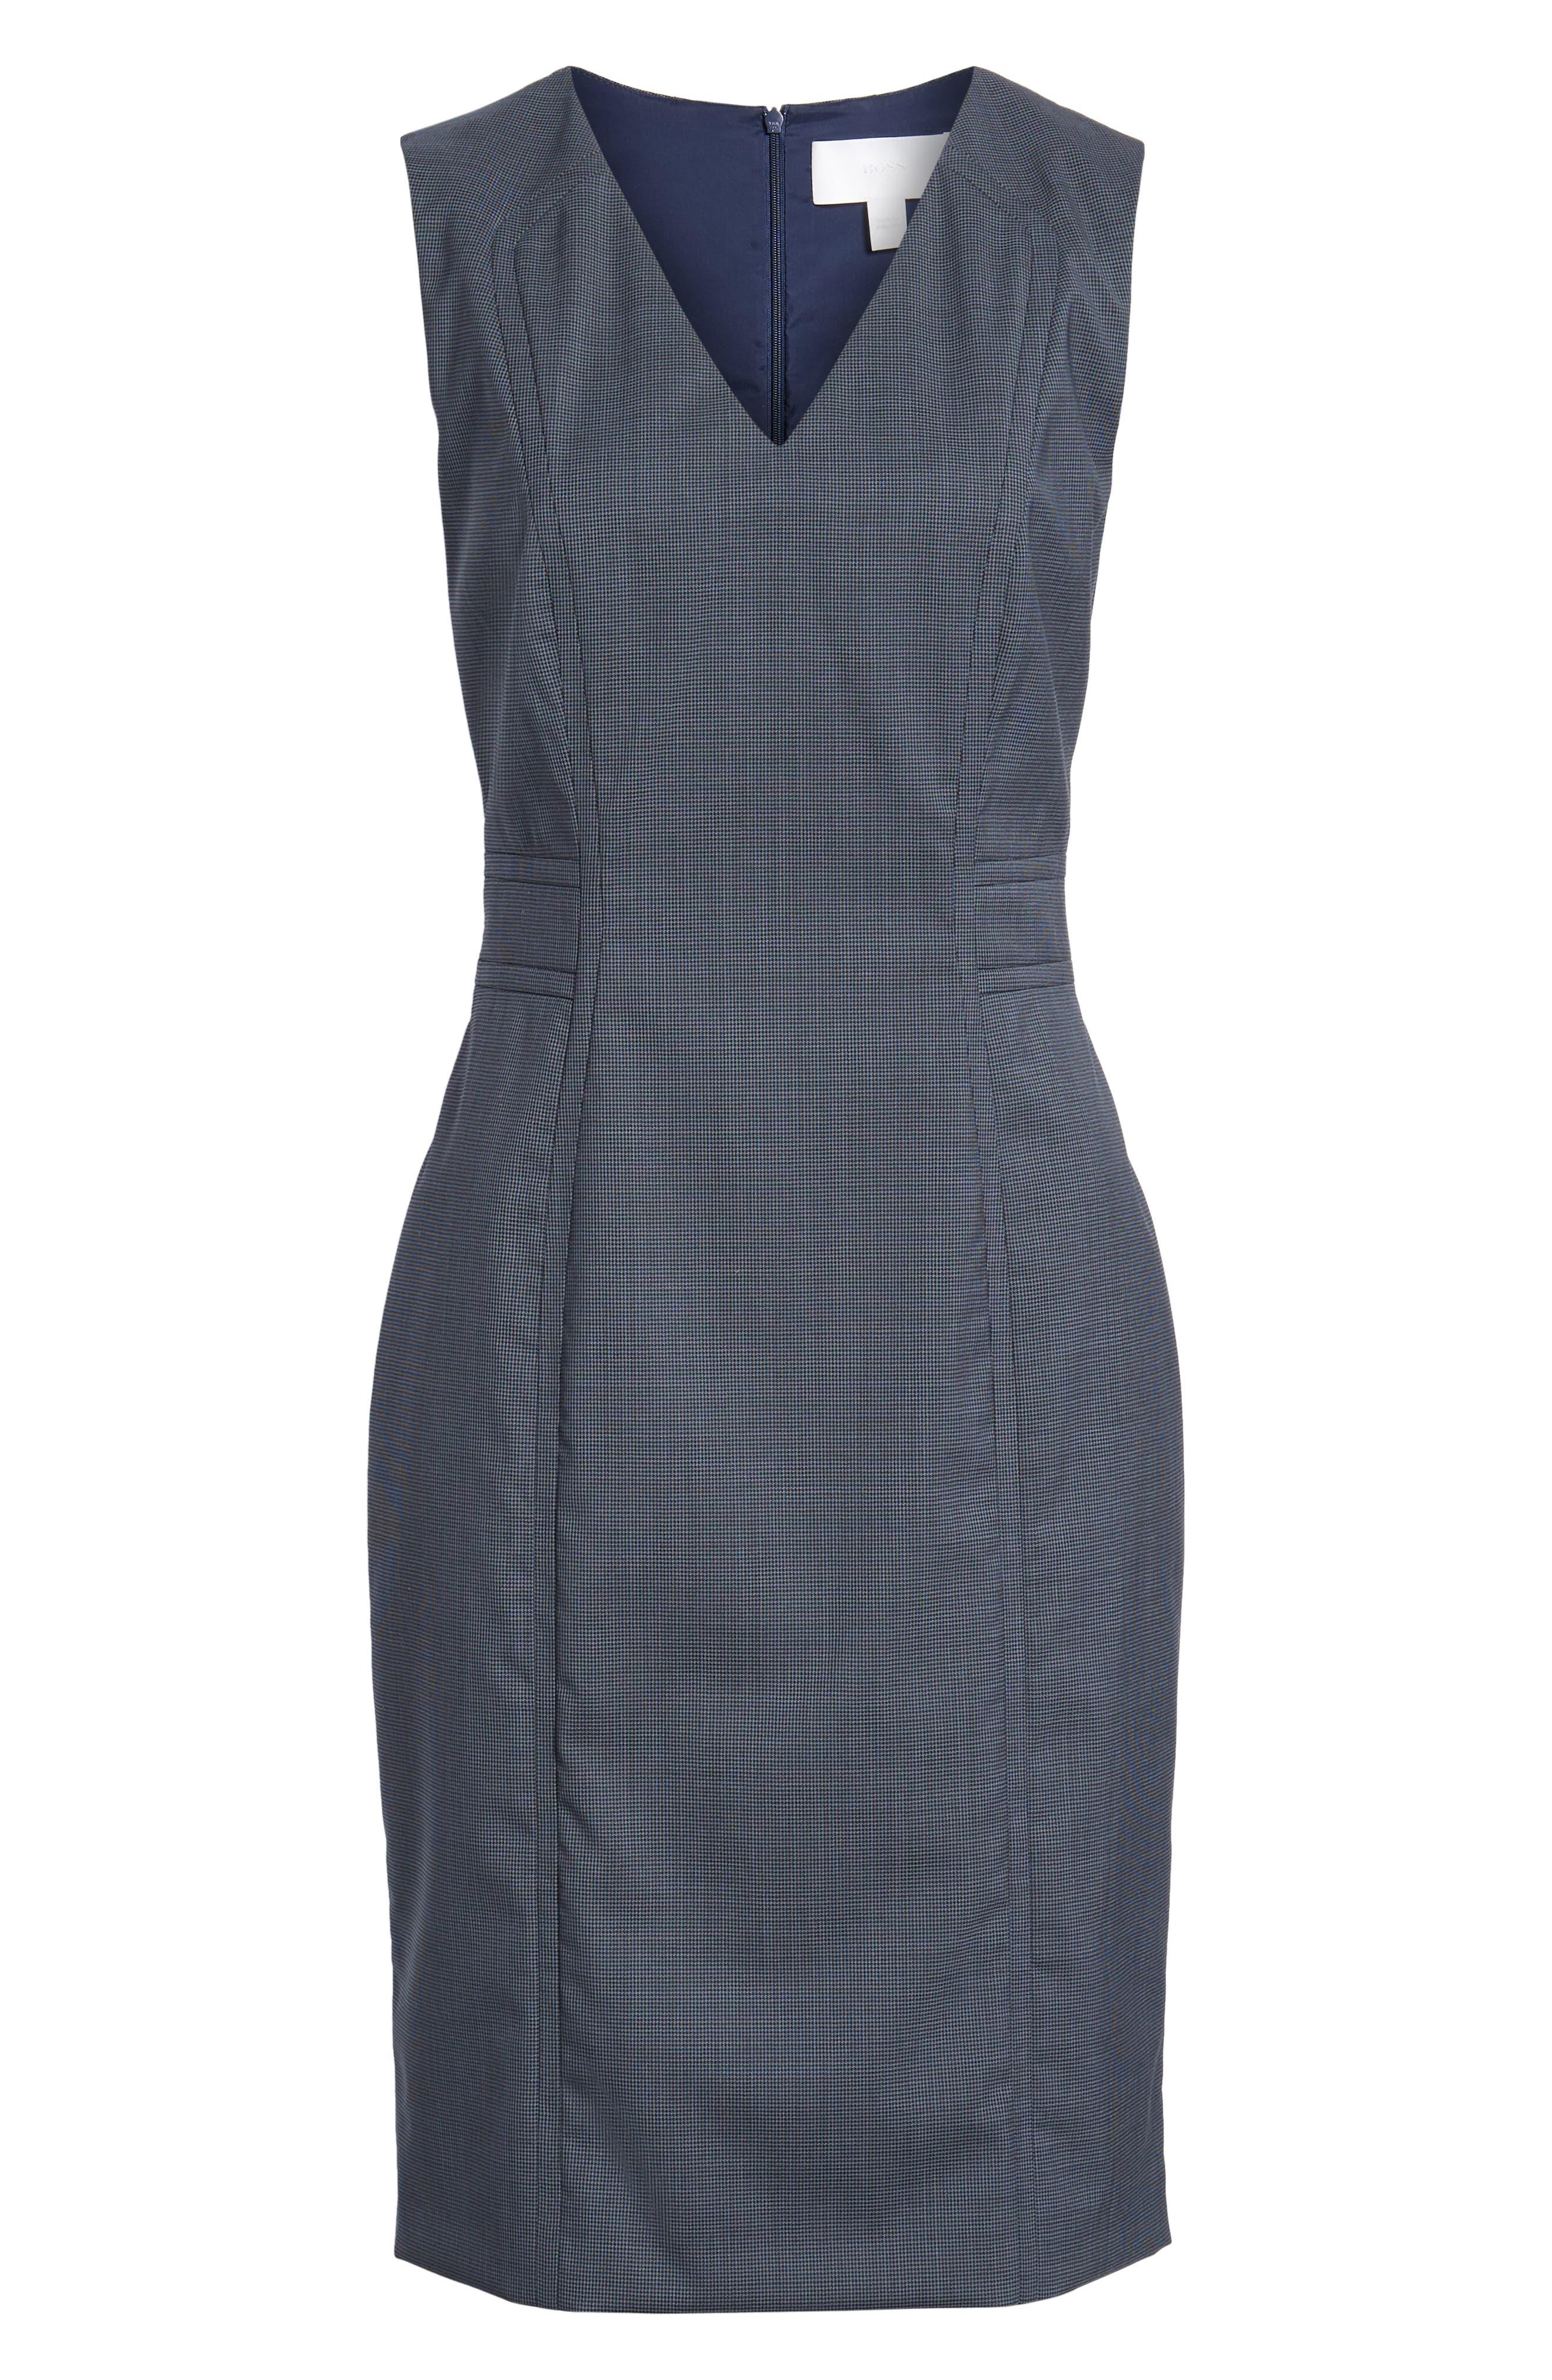 Dalouise Pepita Stretch Wool Sheath Dress,                             Alternate thumbnail 6, color,                             462